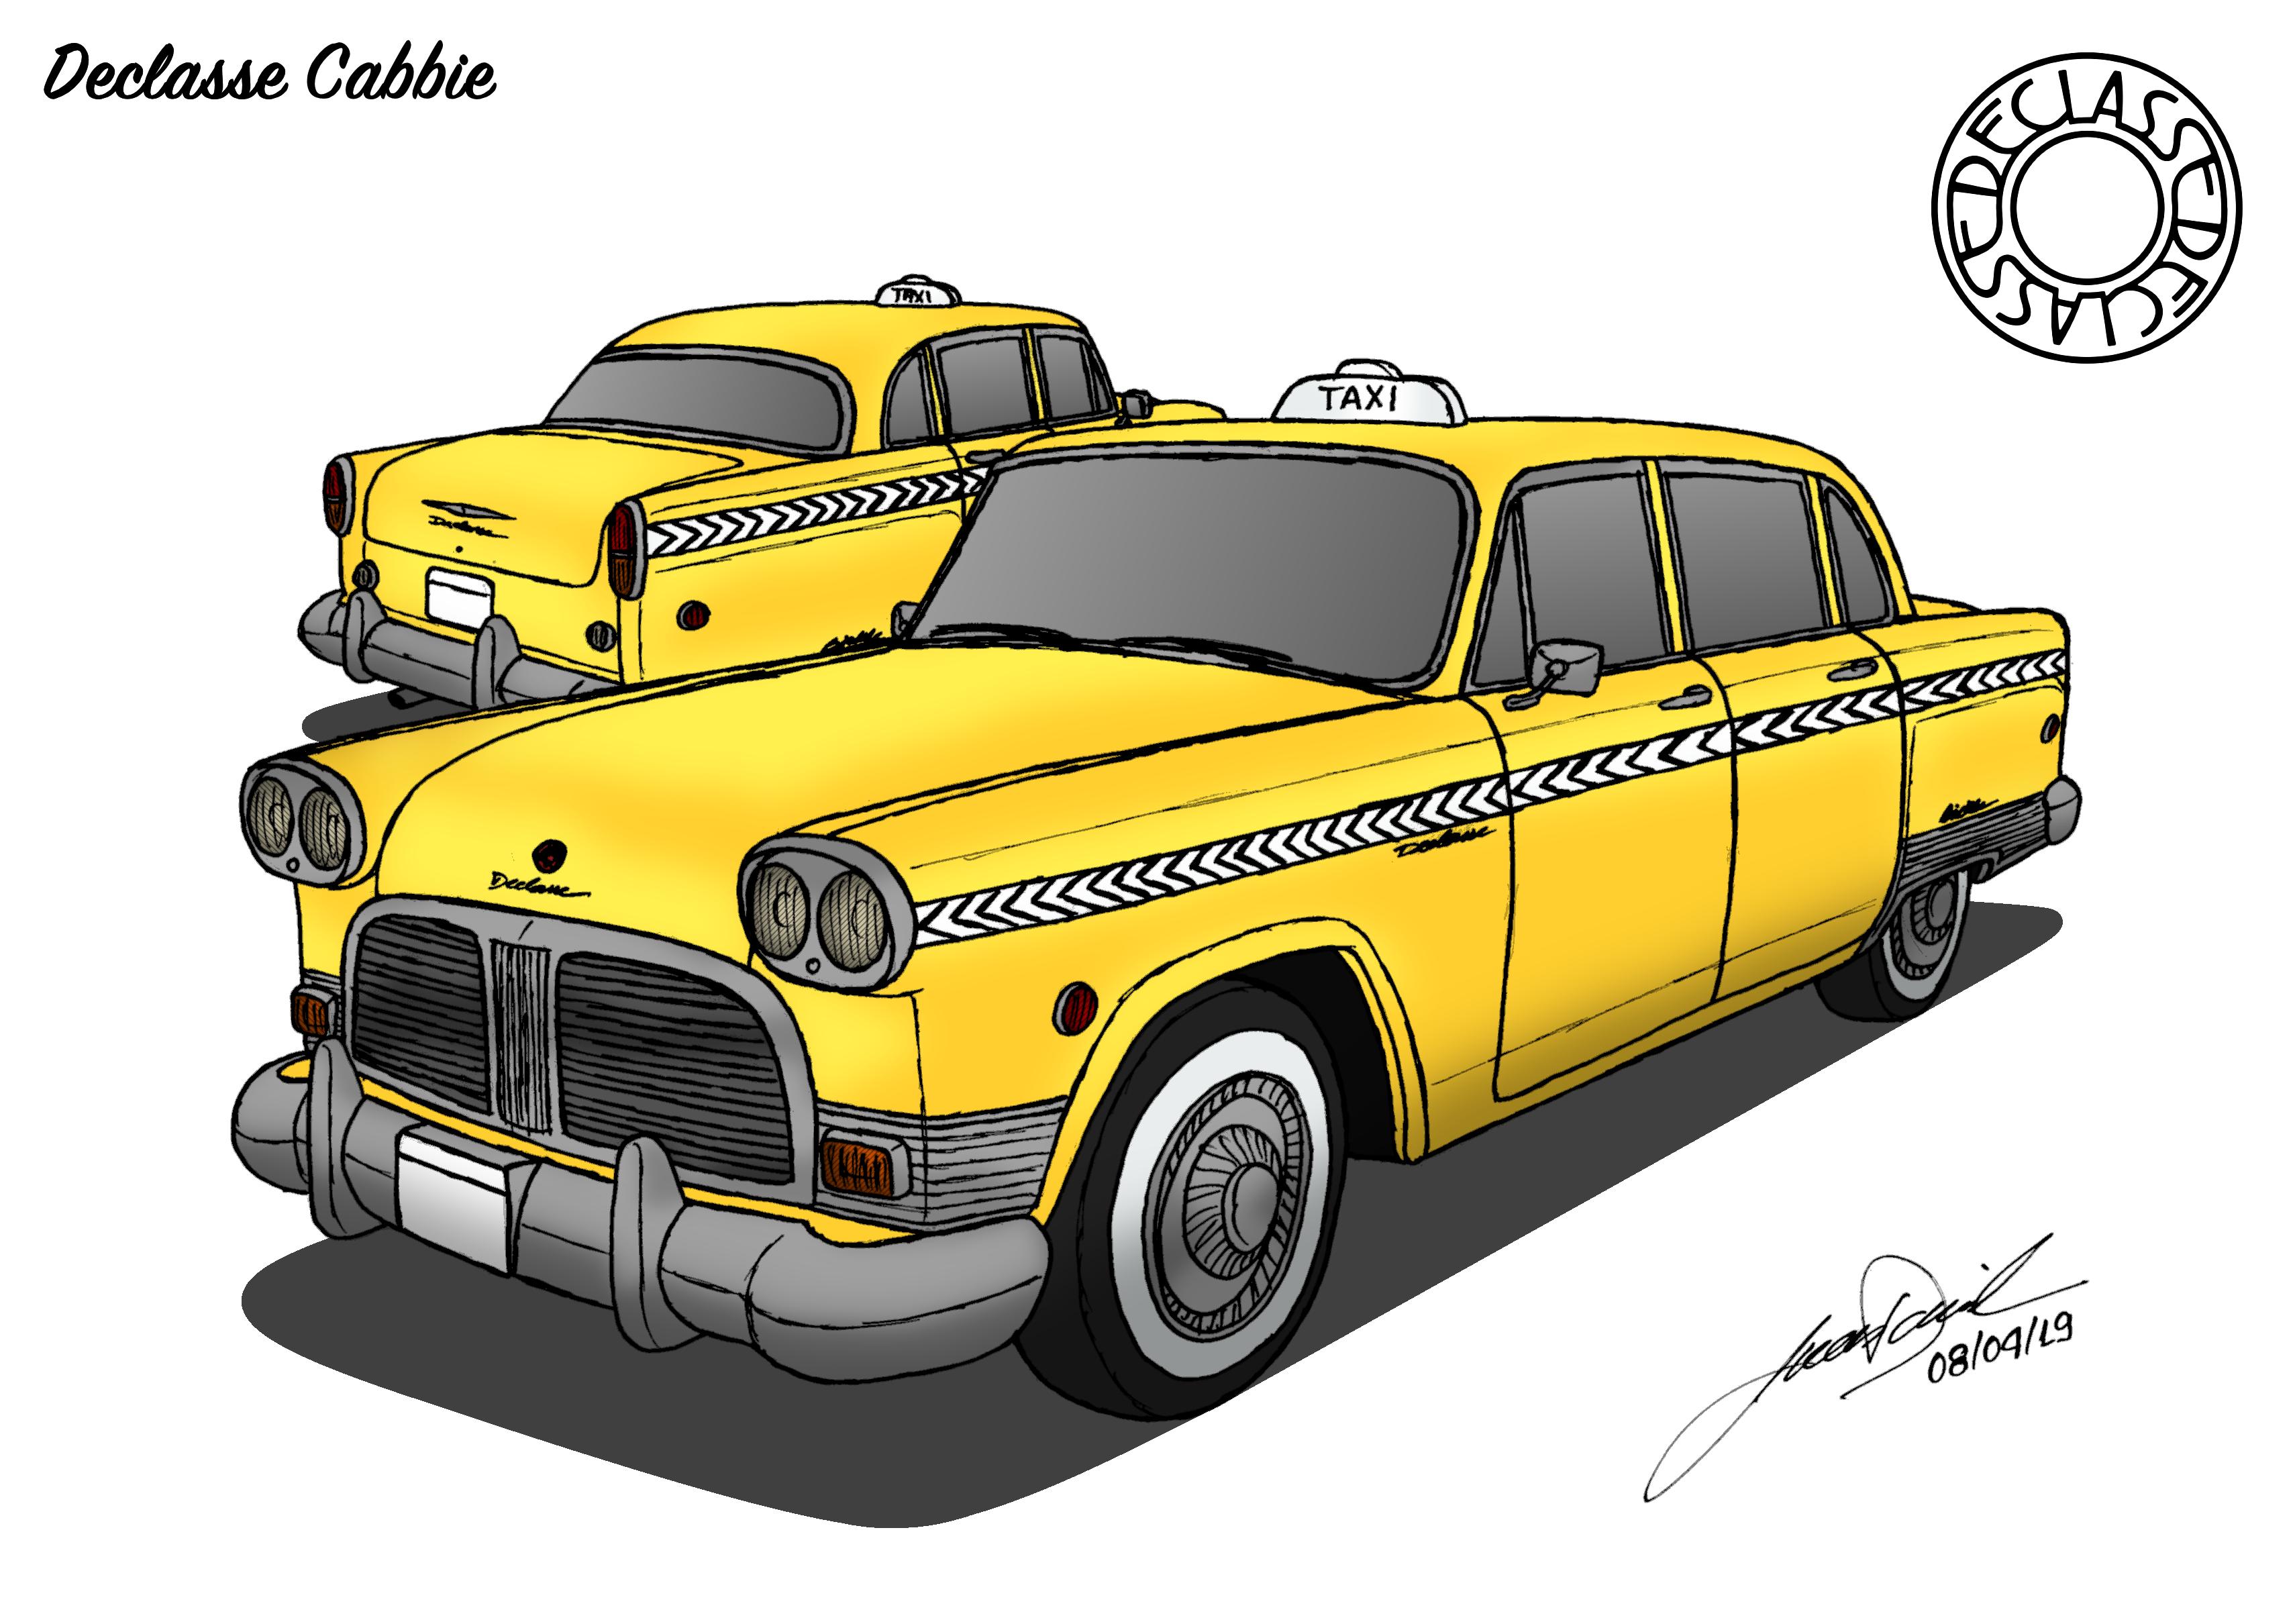 Declasse_Cabbie_2.png